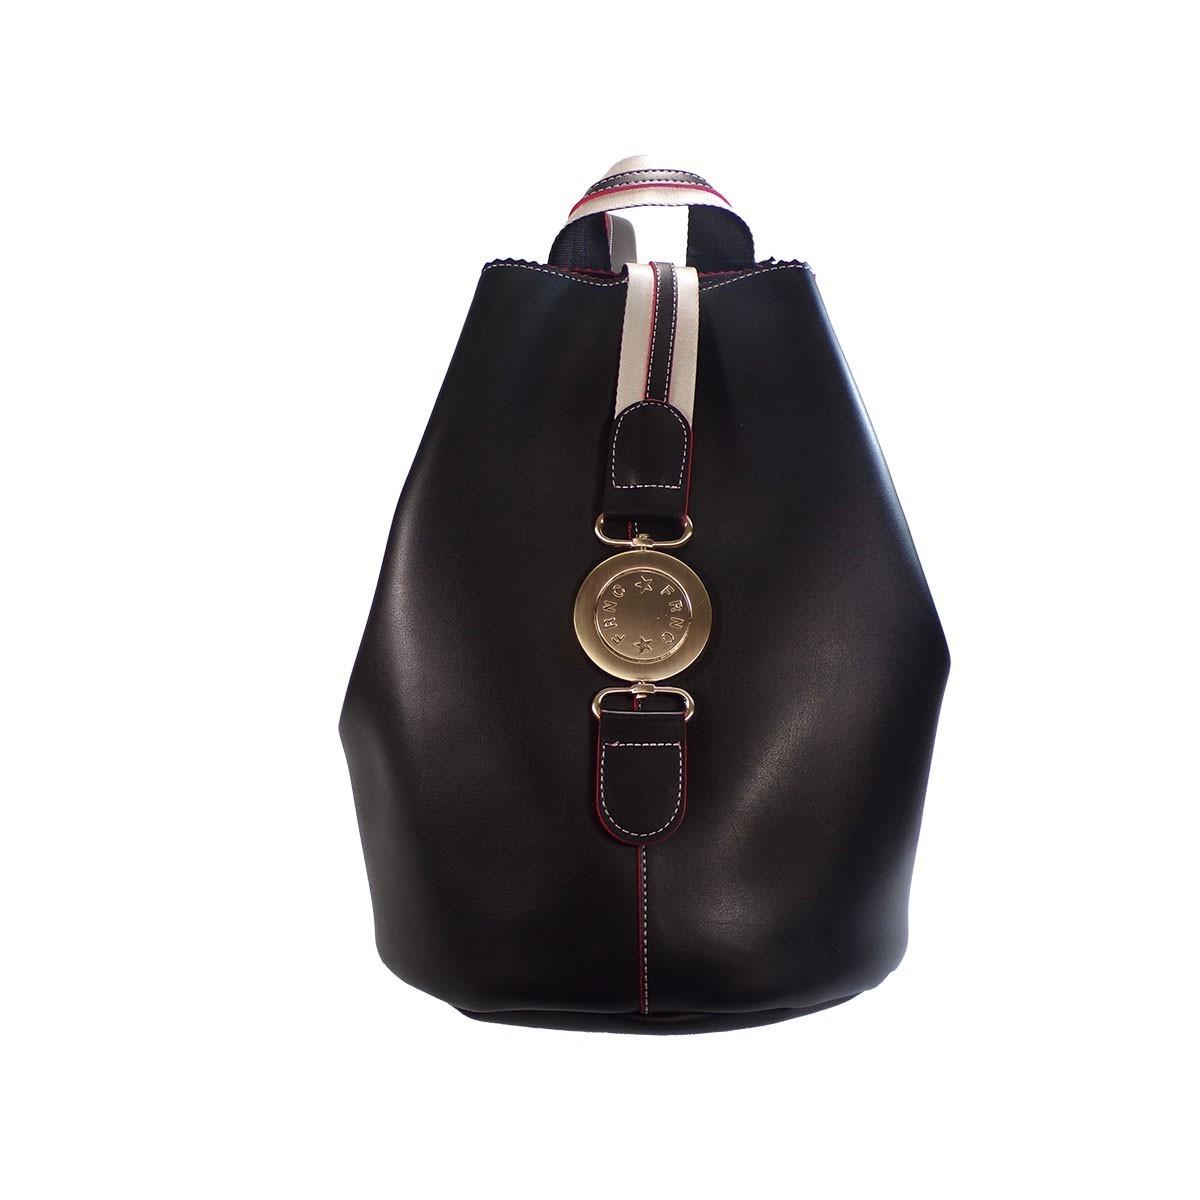 43f8e318c7 FRNC FRANCESCO Τσάντα Γυναικεία Πλάτης-Backpack 563 Μαύρο Δέρμα ...